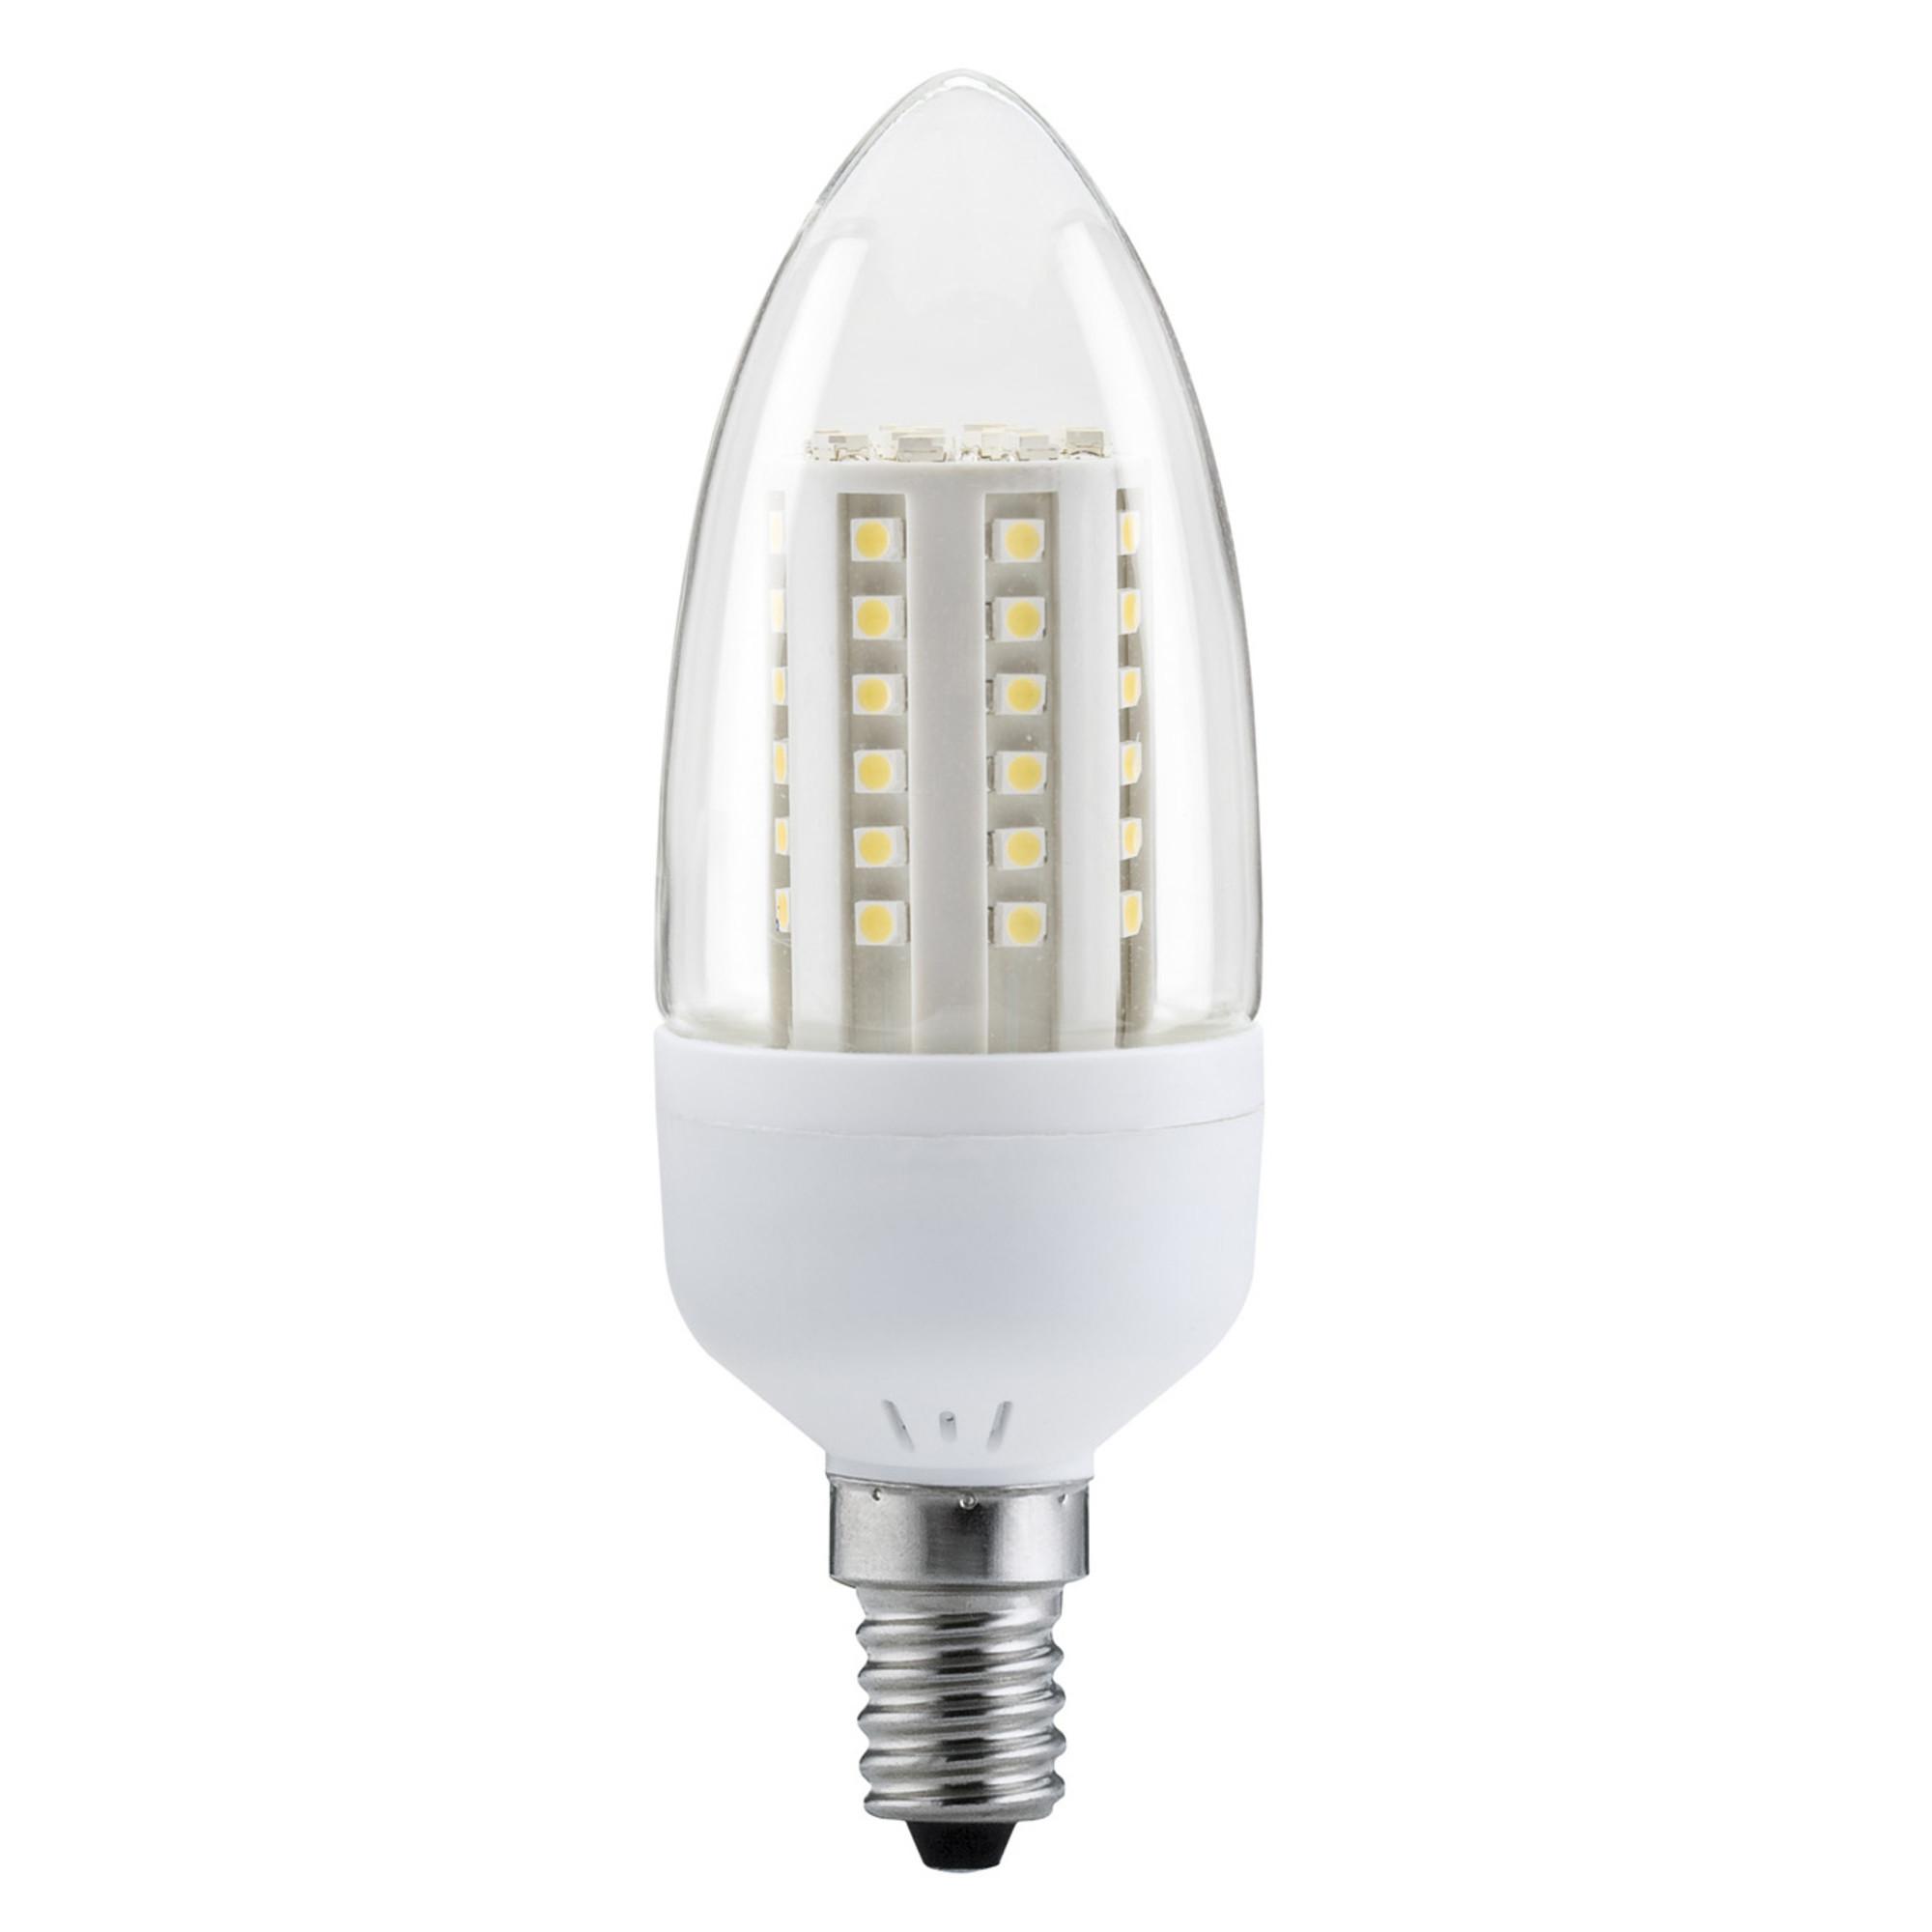 Лампа светодиодная Paulmann 28108 E14 250 Лм теплый свет